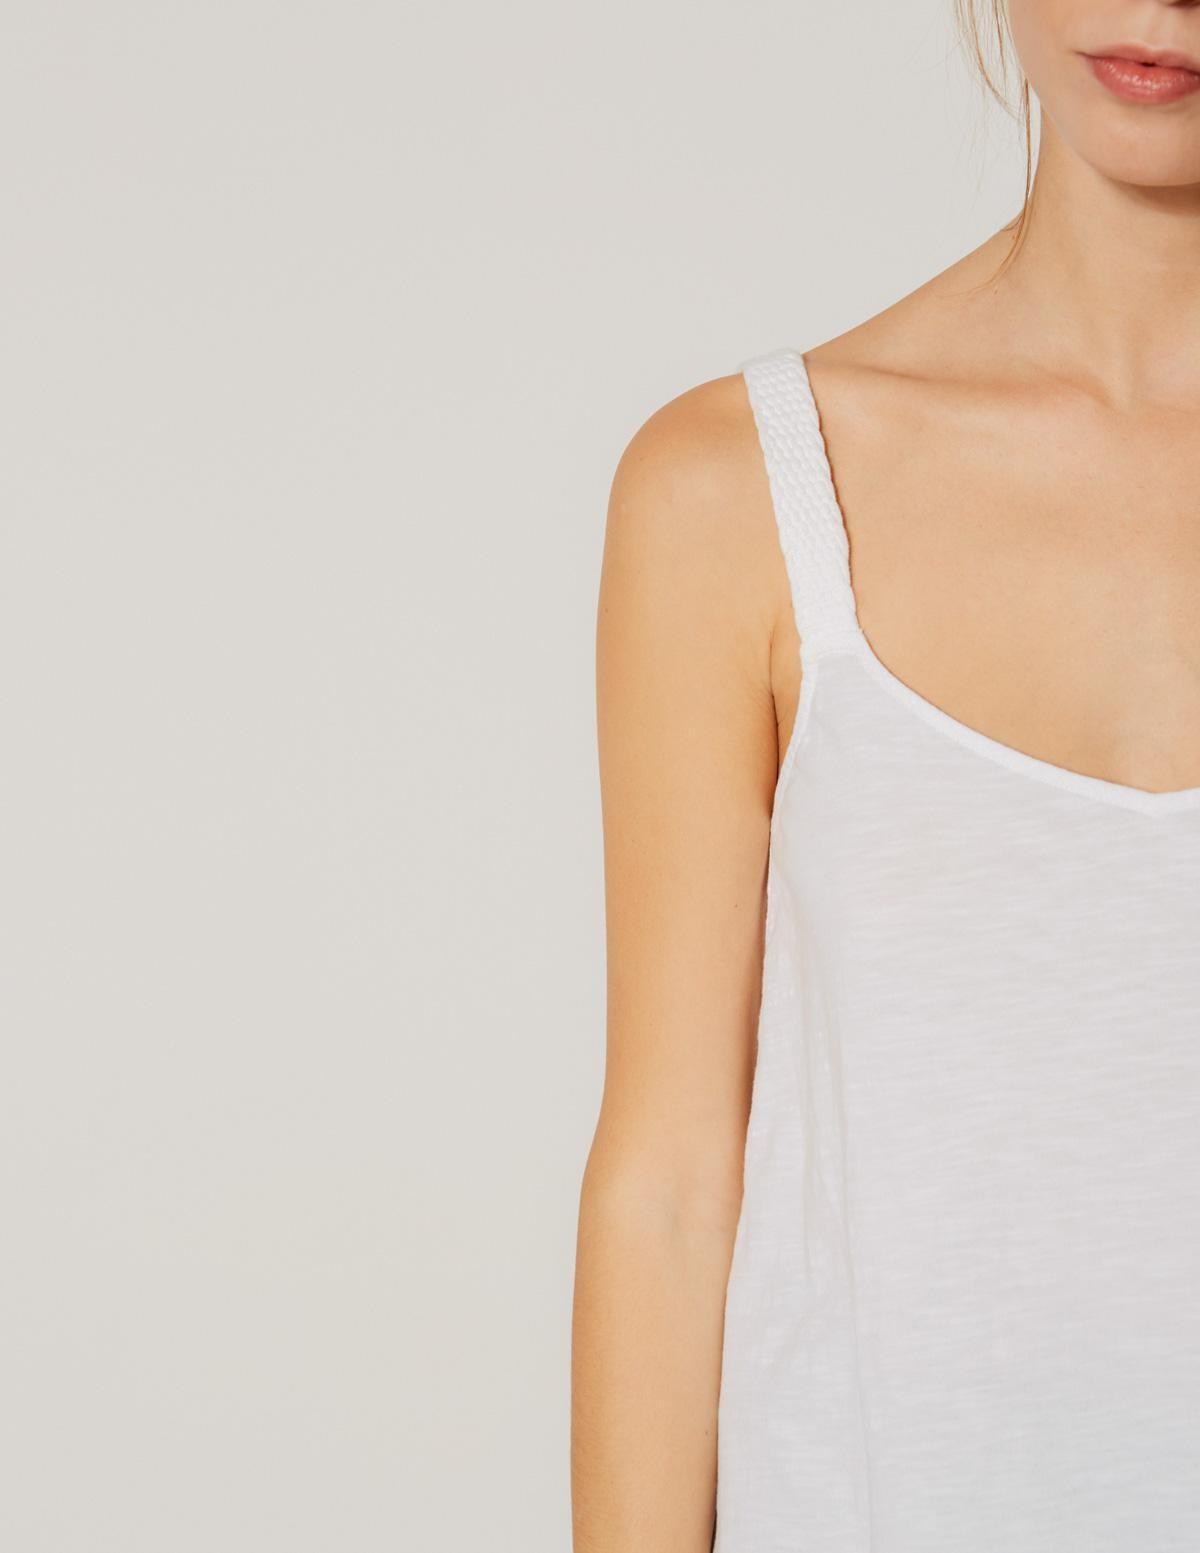 Camiseta tirantes trenzados - Ítem1